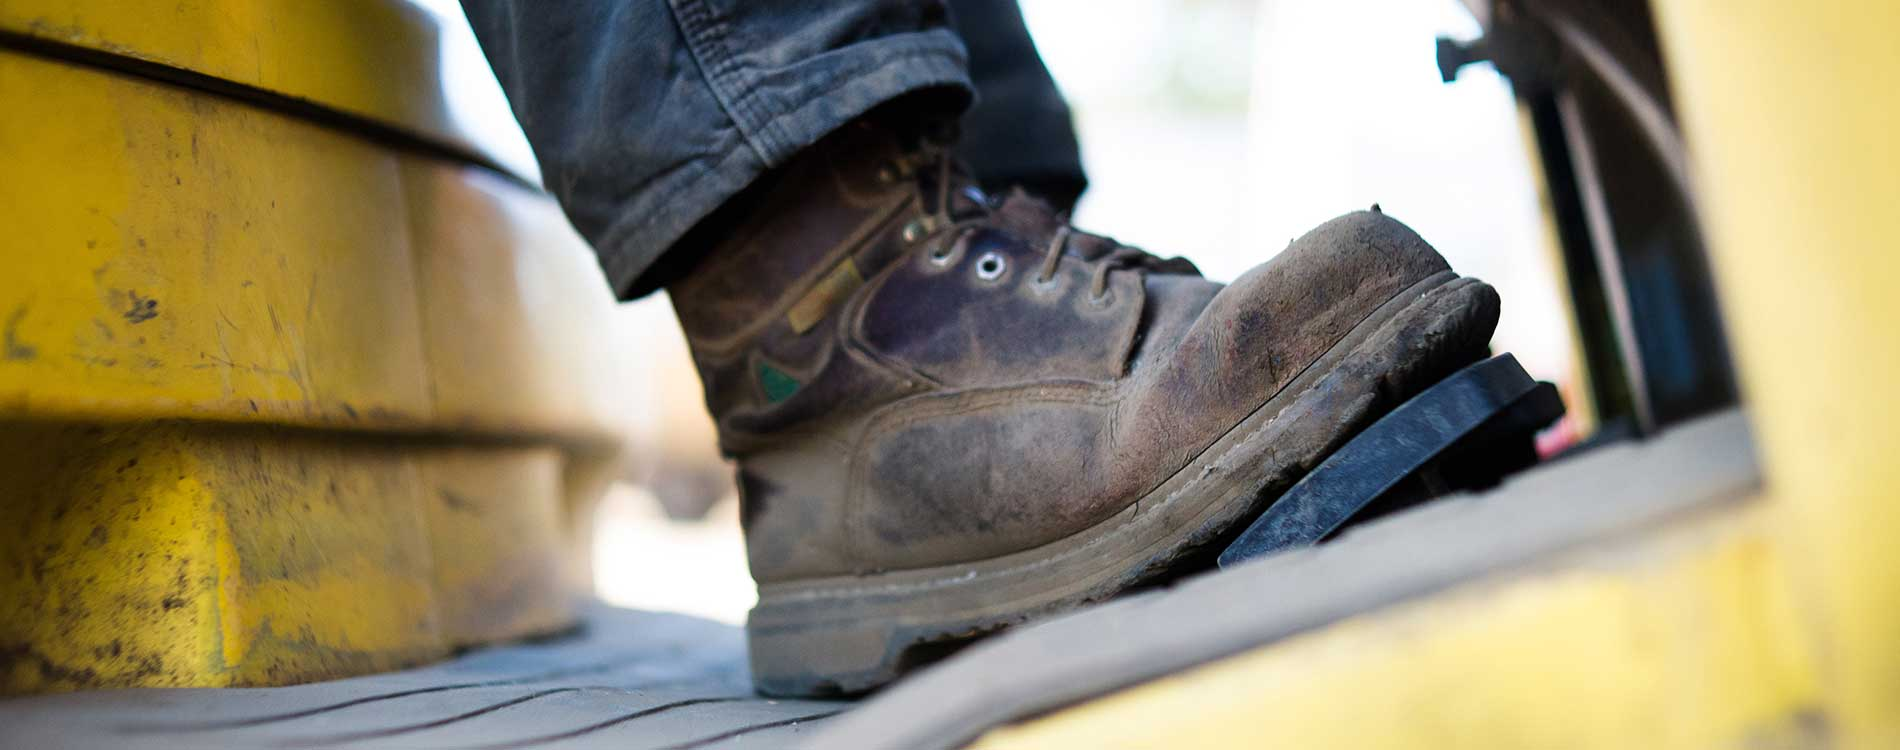 steel toed boot